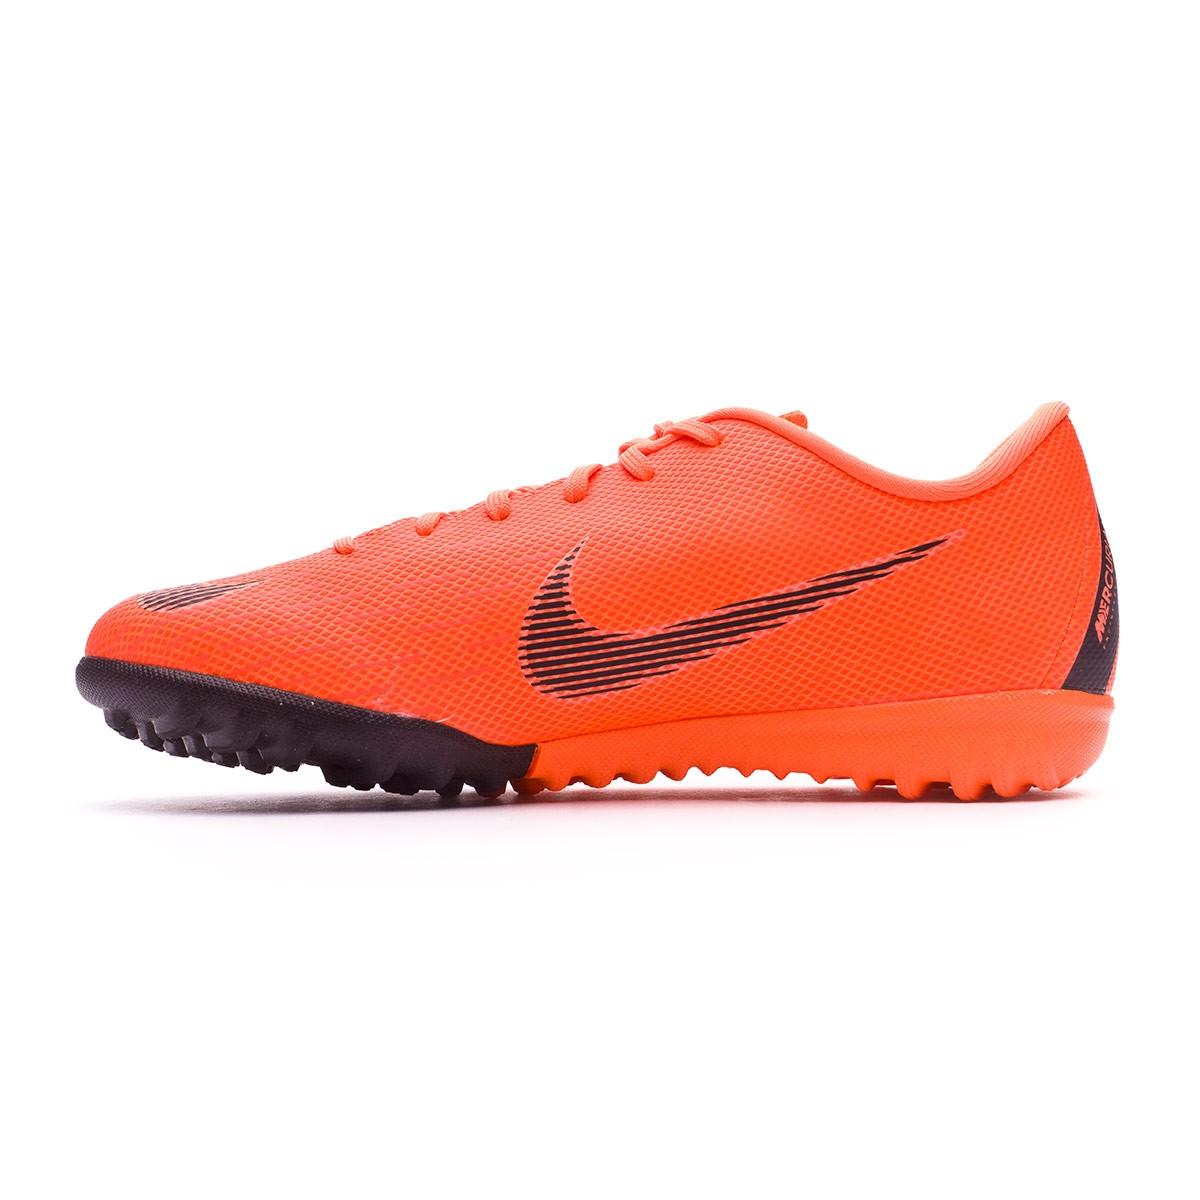 3069f6ad5e258 Tenis Nike Mercurial VaporX XII Academy GS Turf Niño Total  orange-Black-Volt - Tienda de fútbol Fútbol Emotion